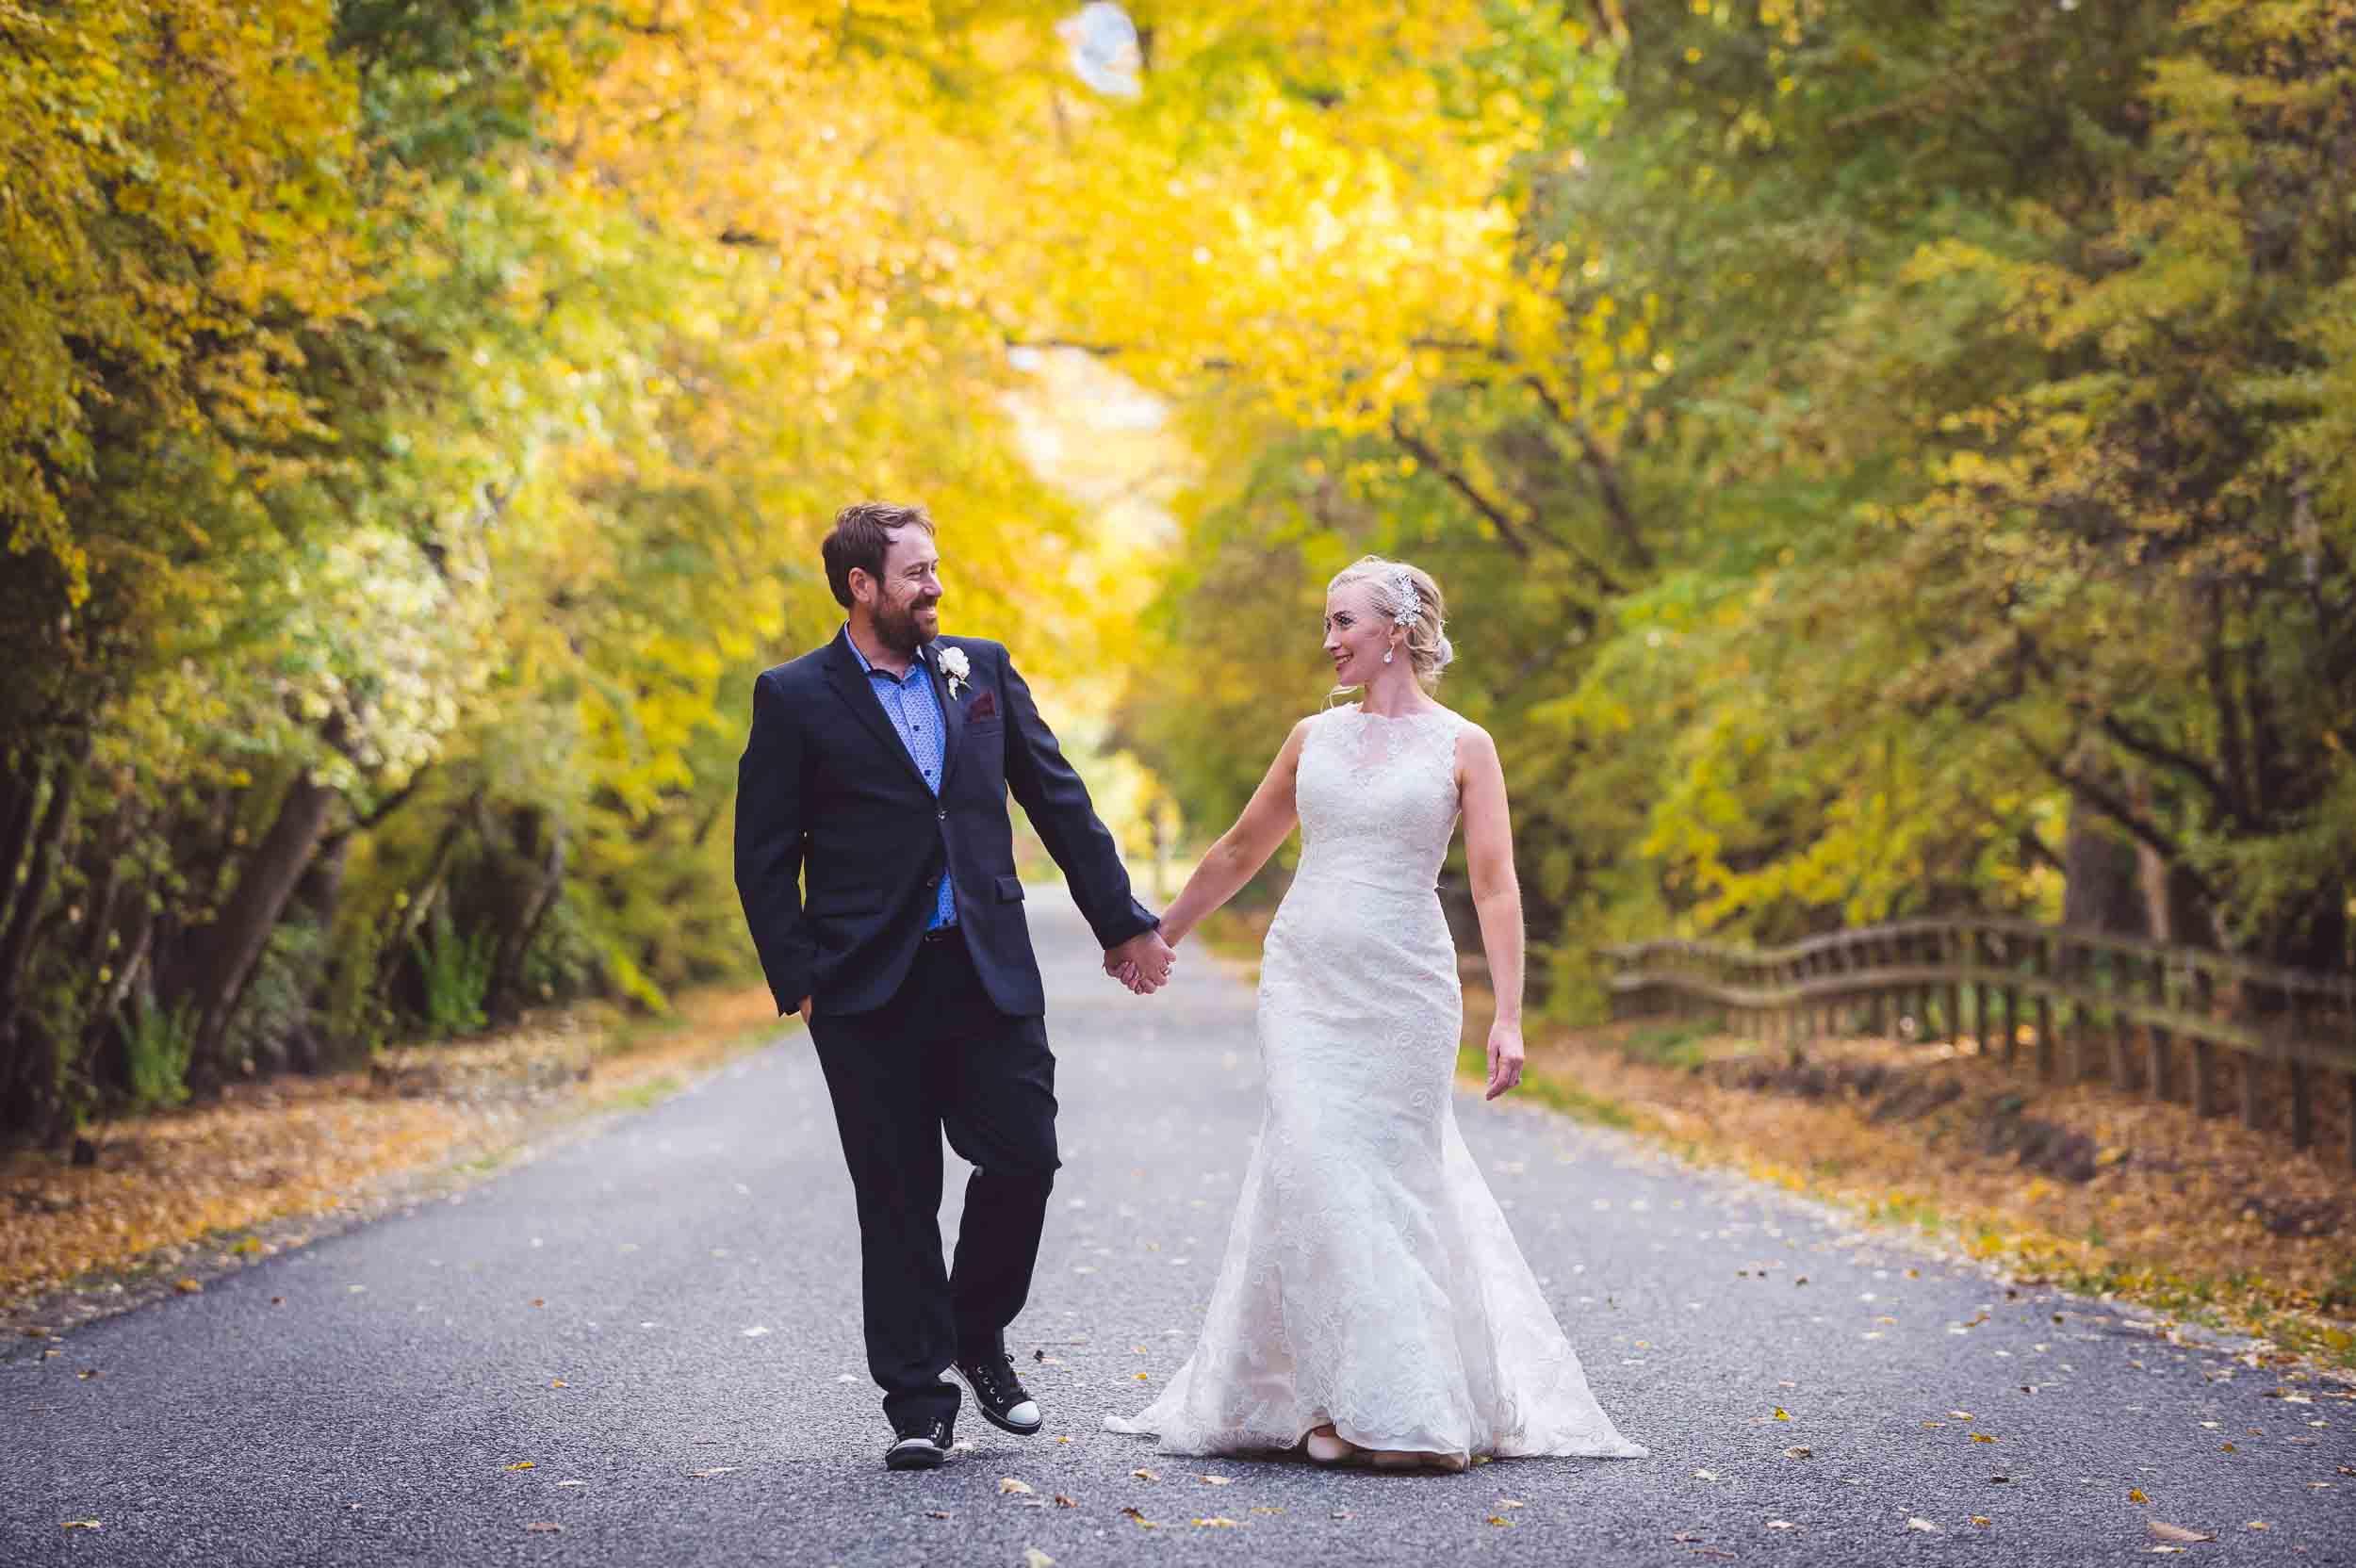 blog post featured image April & Nick's DIY Thurlby Domain Wedding